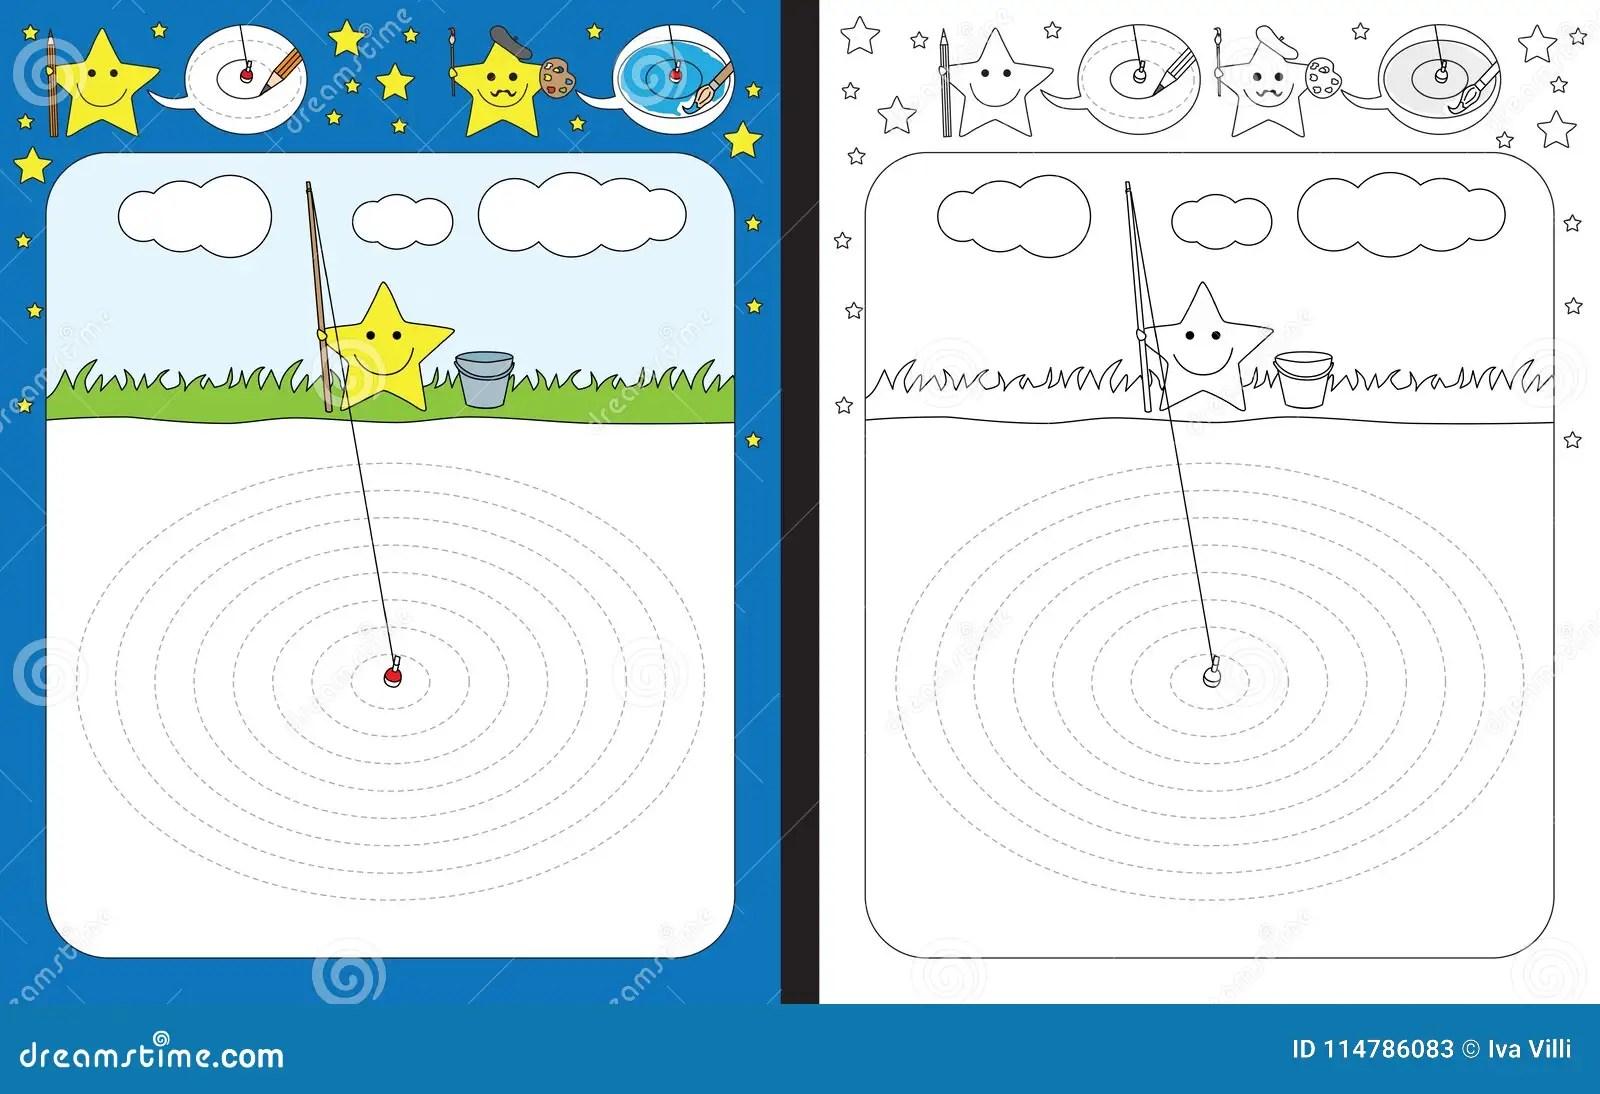 Preschool Worksheet Stock Vector Illustration Of Circle